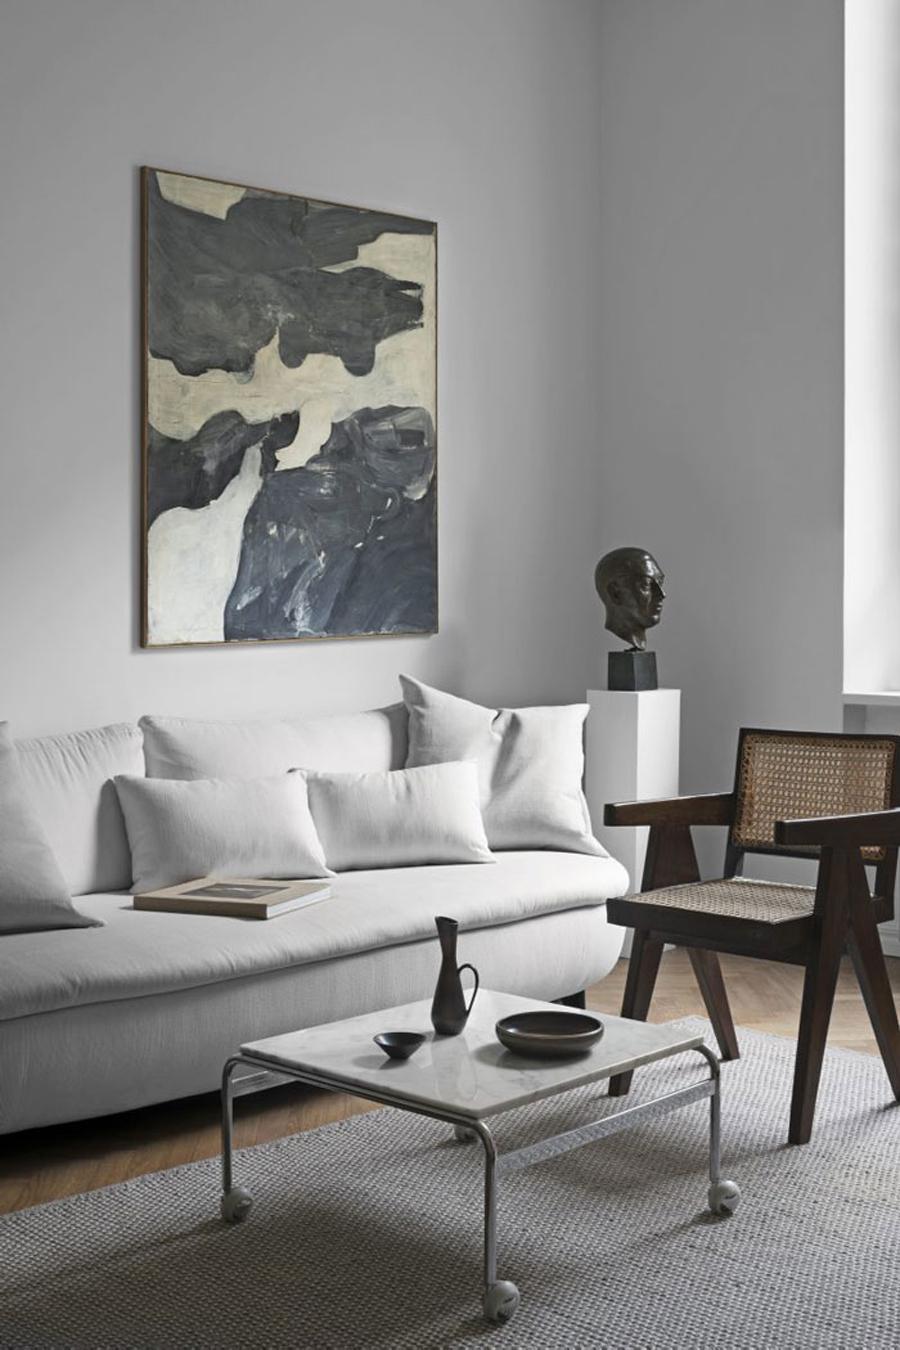 claes-juhlin-minimalism-art-home-1